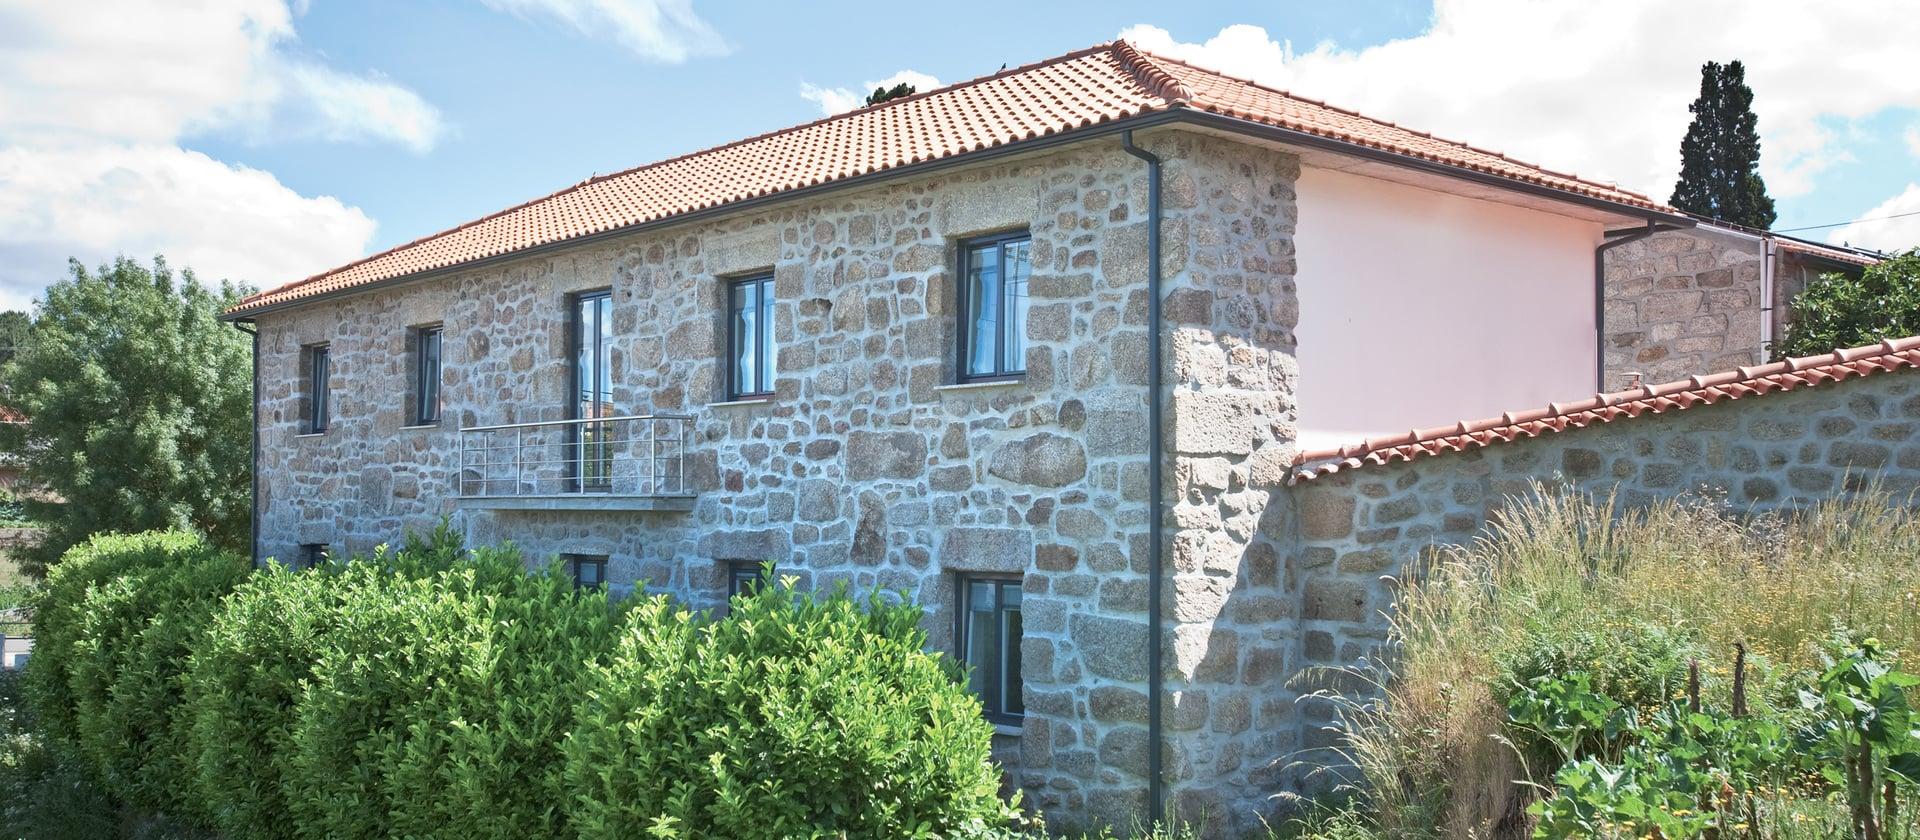 Einfamilienhaus in Portugal